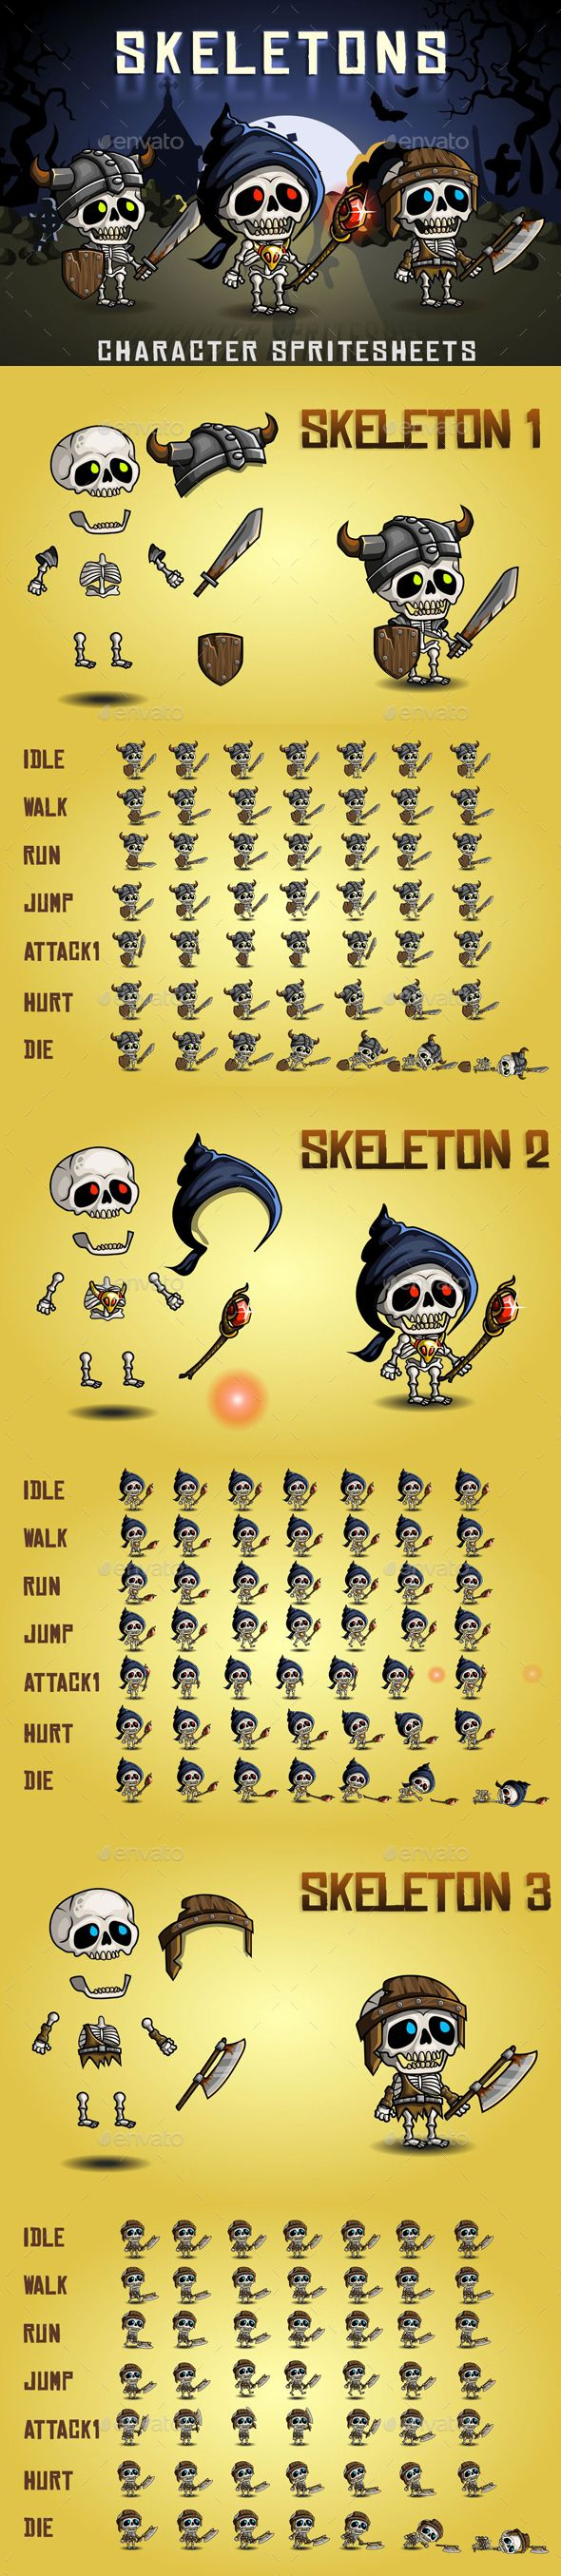 #Skeletons #2D #Game #Character #Sprite #Sheet #Template - Sprites Game #UI #UX #Assets #Design. Download here: https://graphicriver.net/item/skeletons-2d-game-character-sprite-sheet/19563497?ref=yinkira